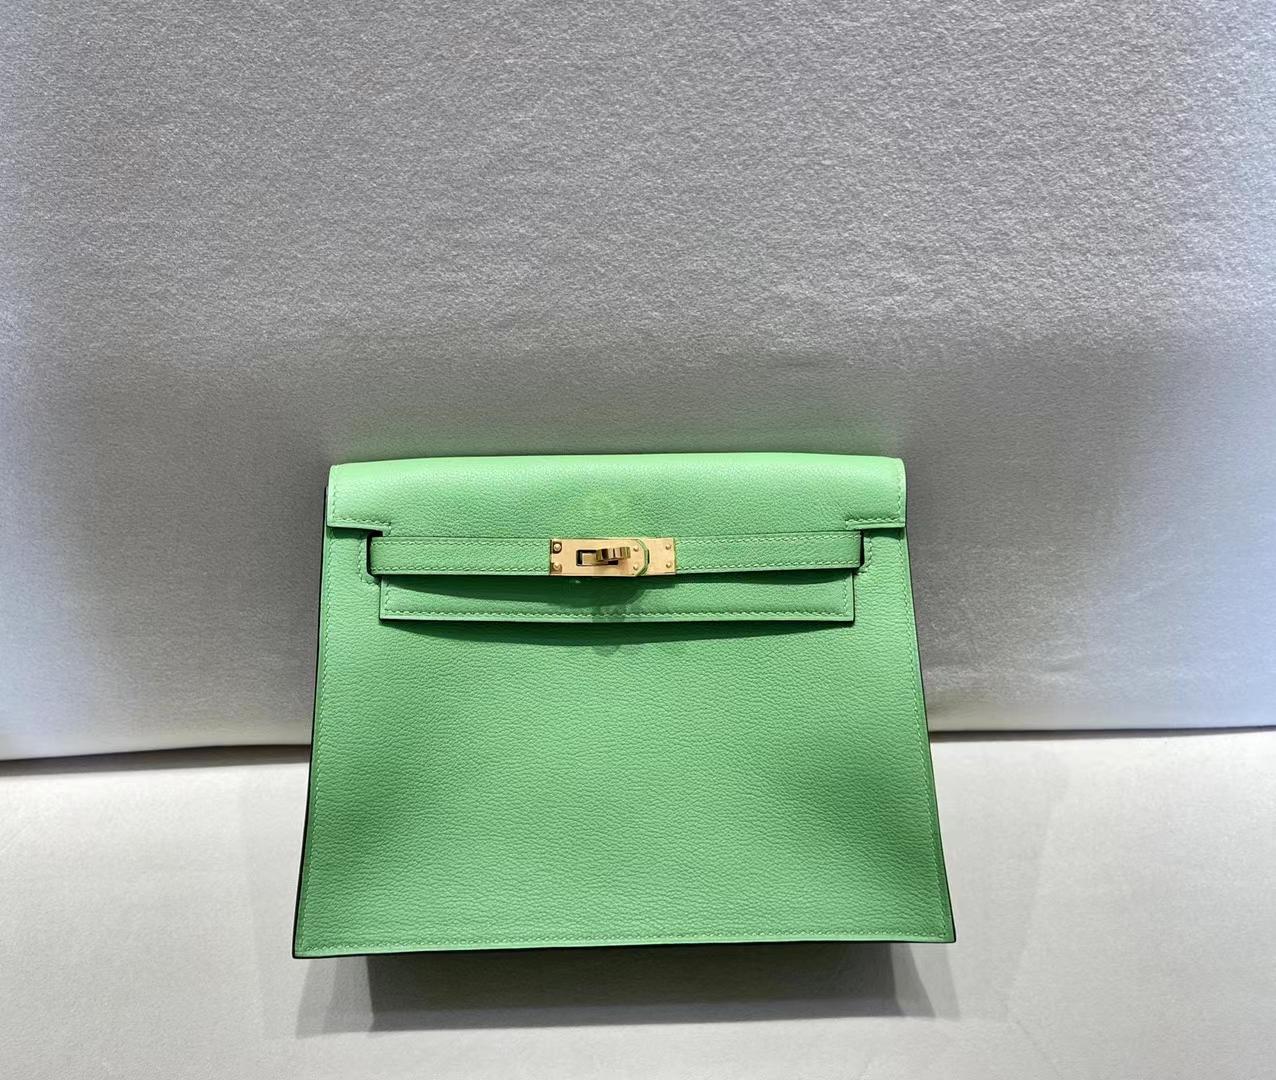 Hermès(爱马仕)Danse 跳舞包 evercolor 牛油果绿 顶级纯手工